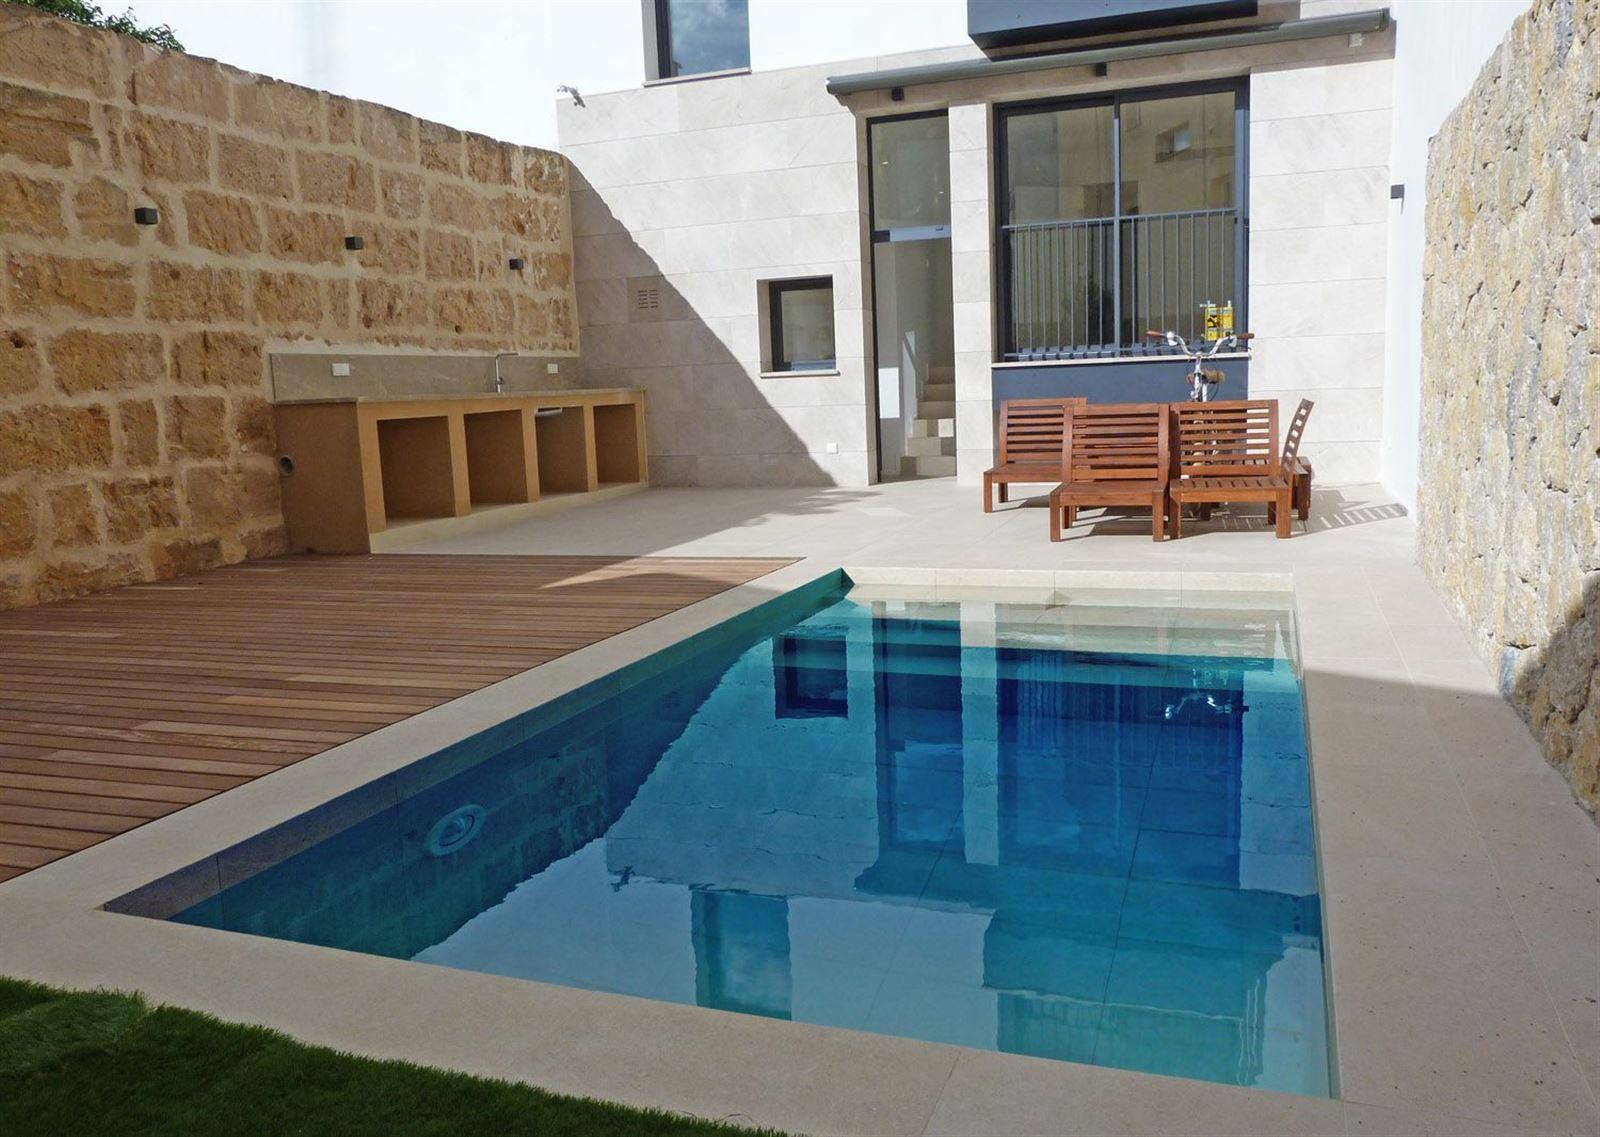 Piso  Palma de mallorca. Planta baja de nueva construccion con piscina privada